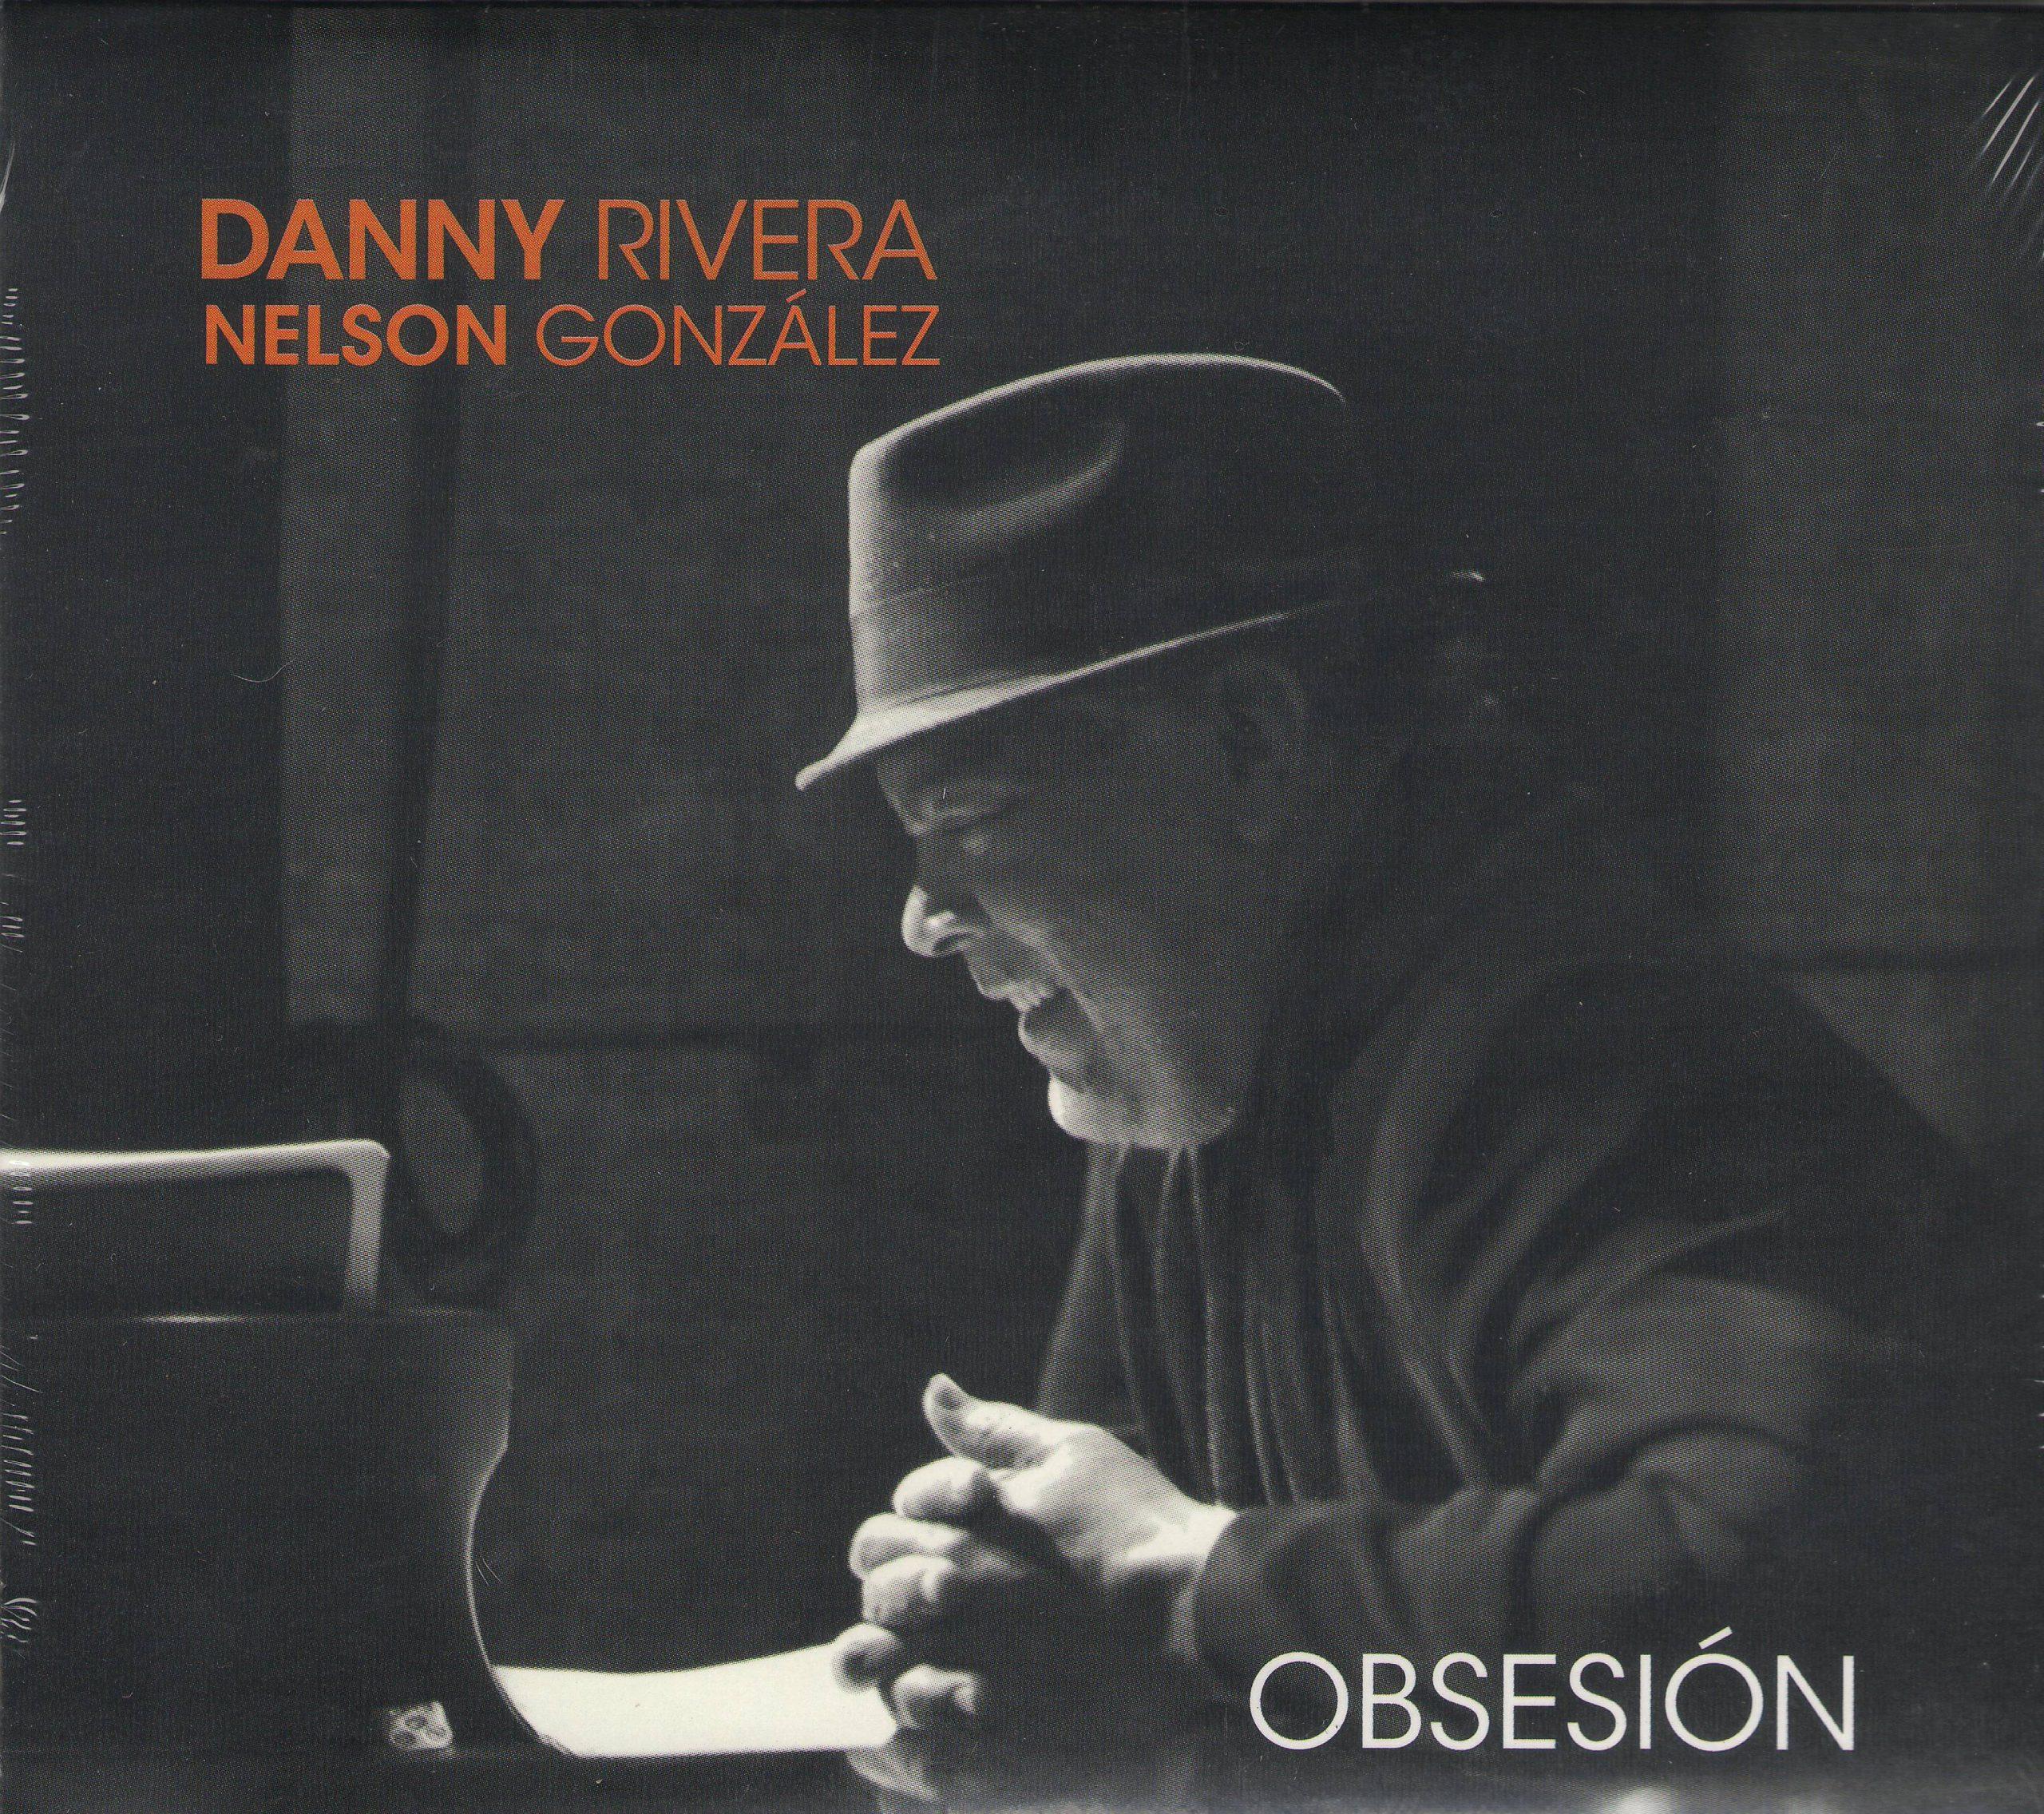 12. Danny Rivera  Nelson Gonzalez  OBSEsiON